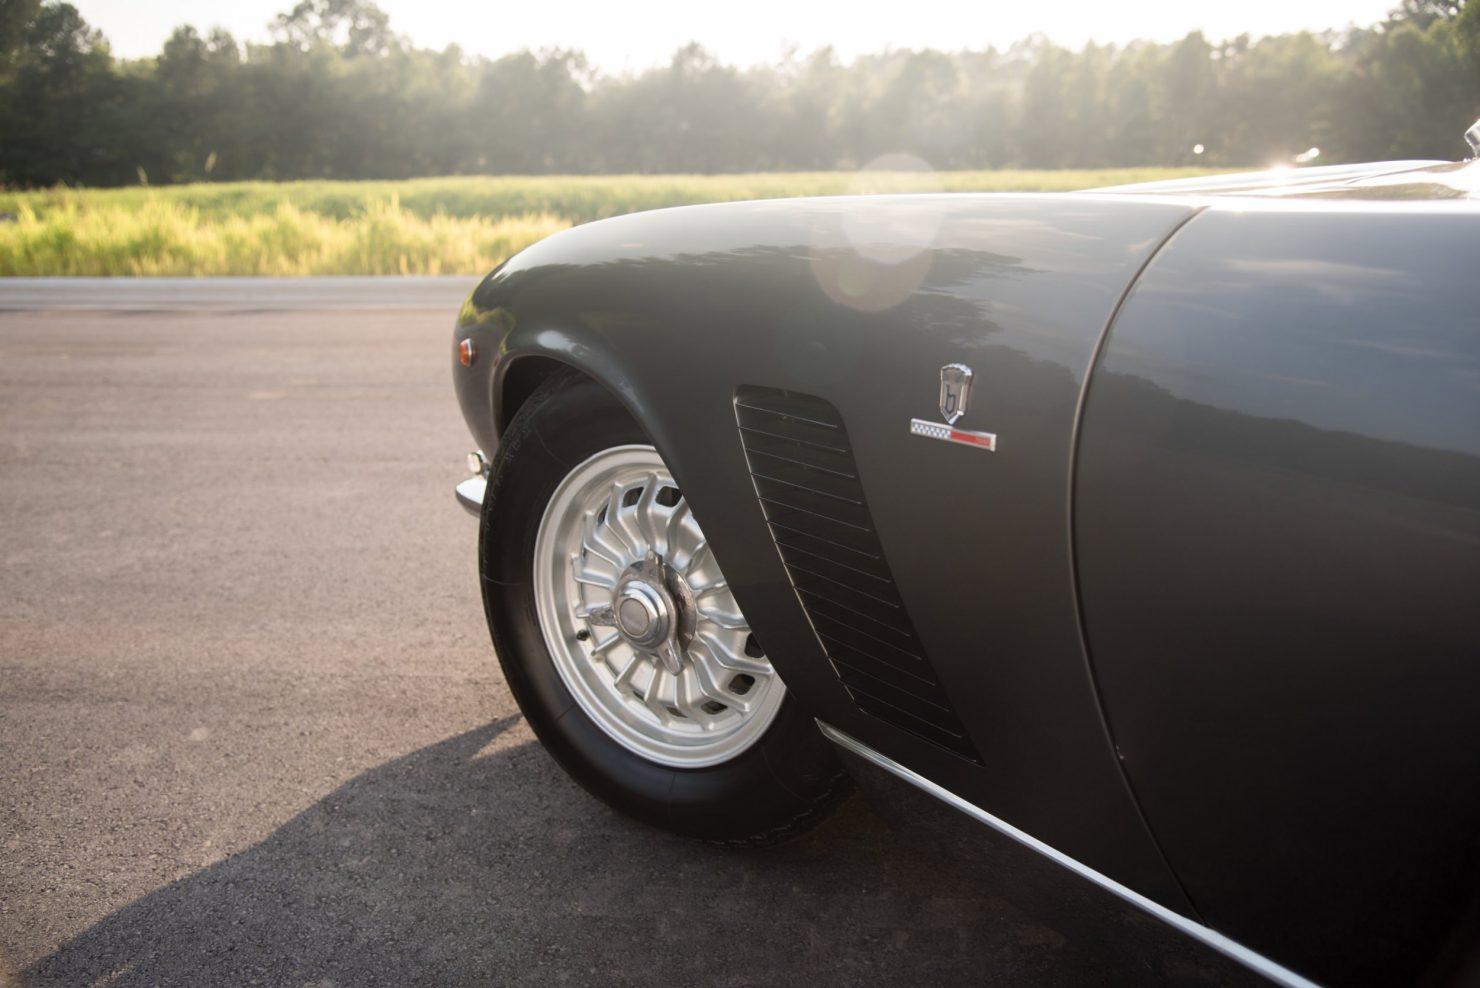 iso grifo car 9 1480x988 - 1966 Iso Grifo GL Series I